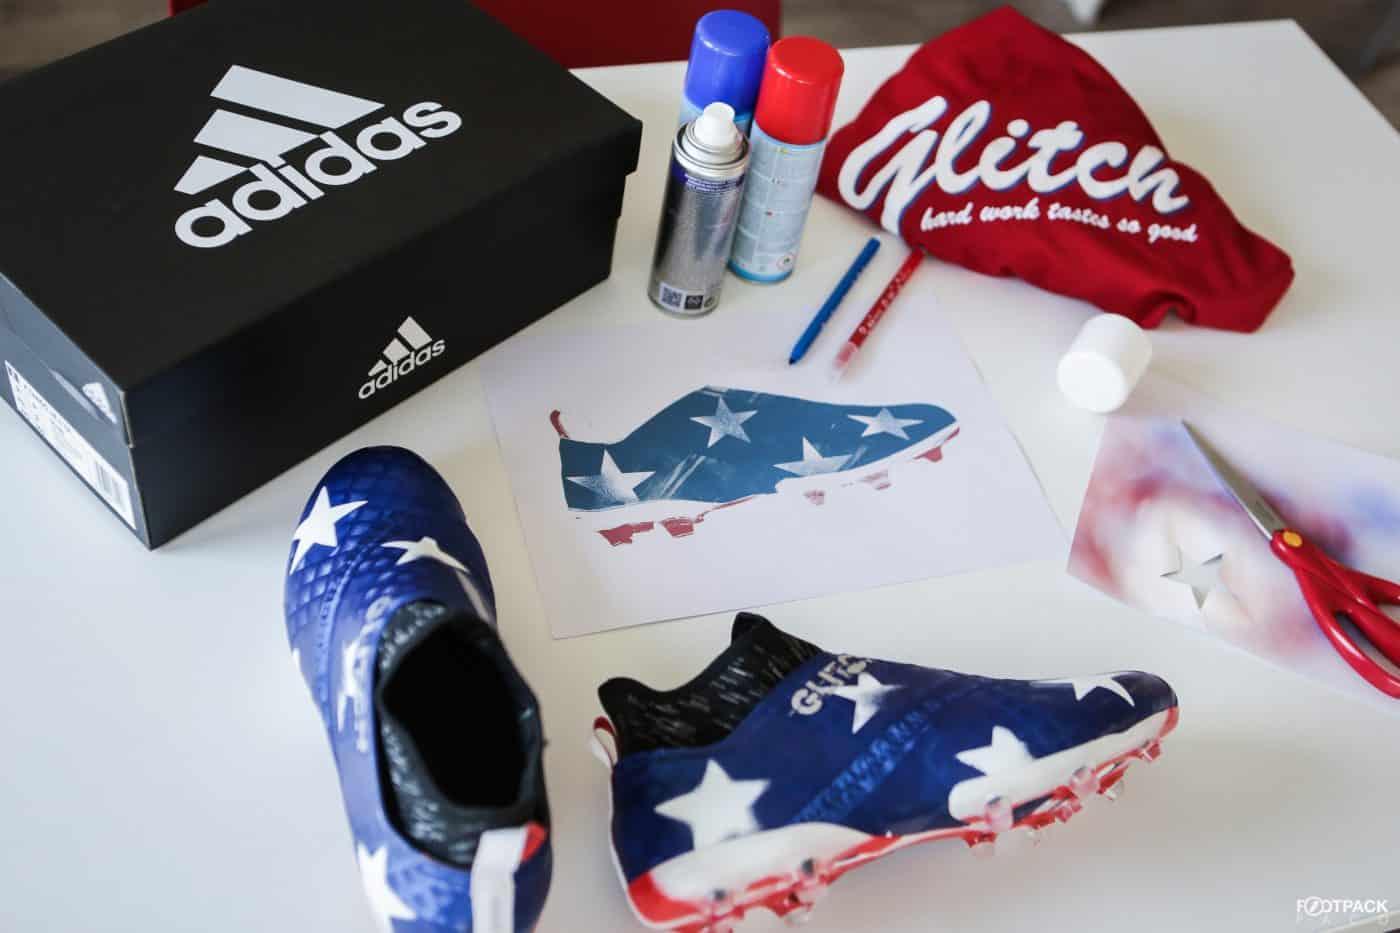 adidas-glitch-skin-worldskin-equipe-de-france-etoiles-8